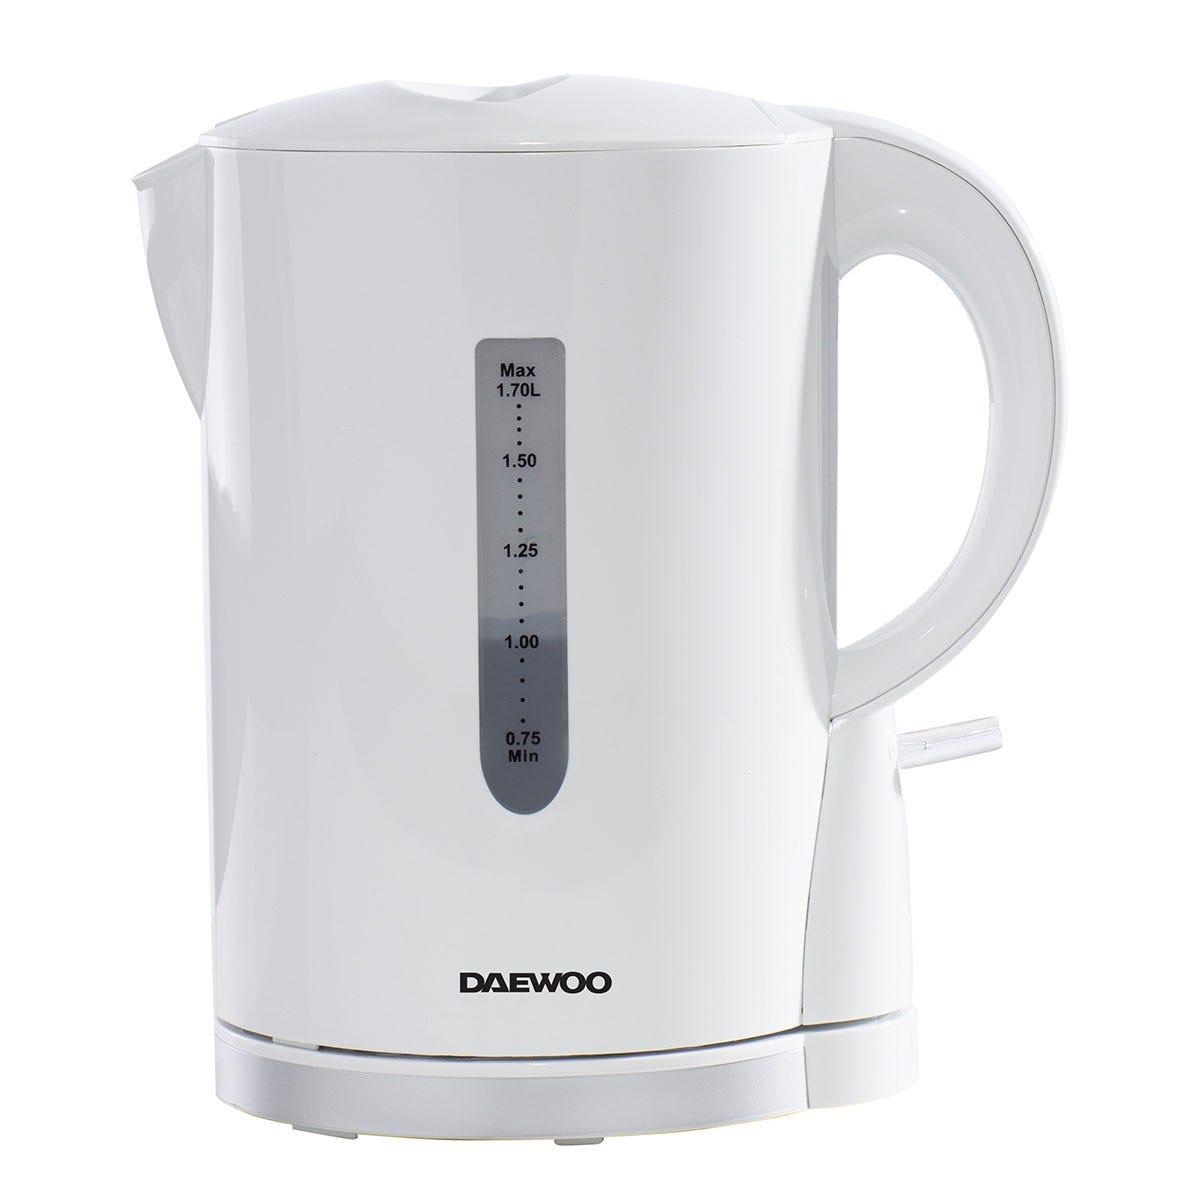 Daewoo SDA1650 2200W 1.7L Plastic Kettle - White with Chrome Band